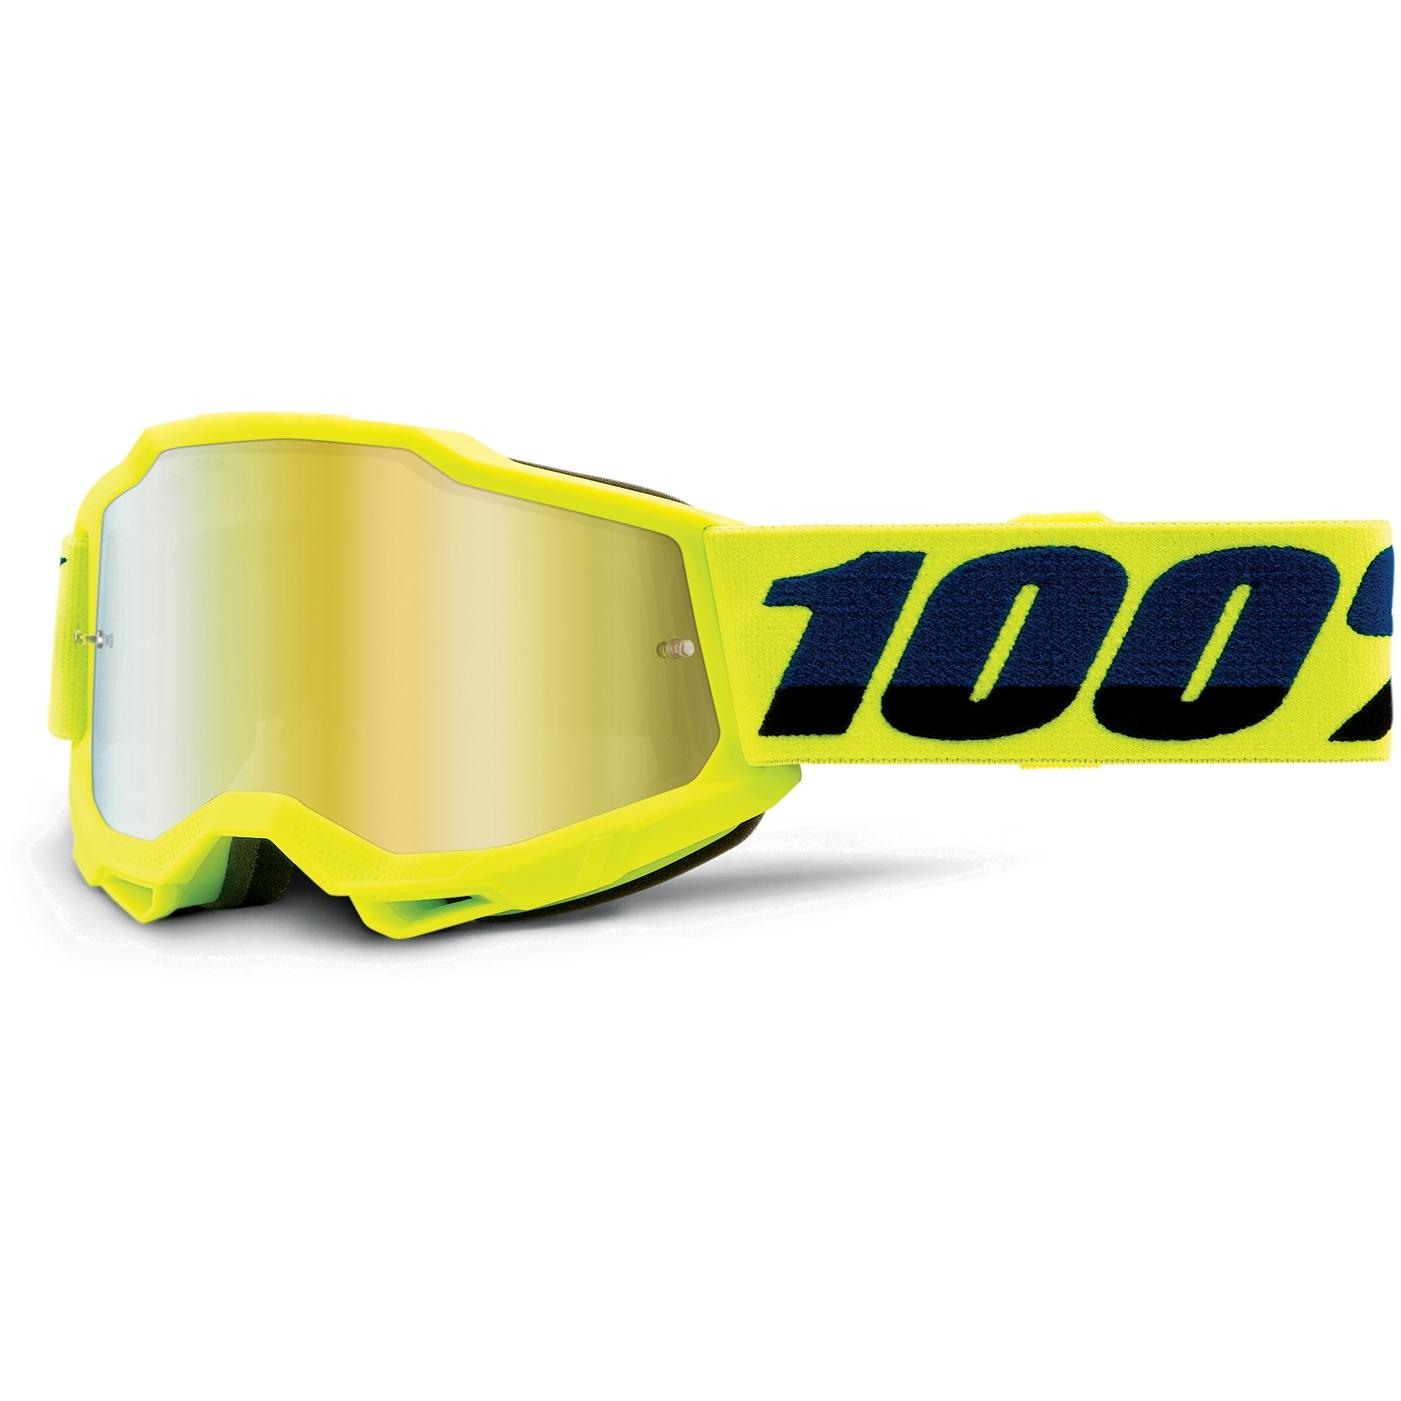 100% Accuri 2 Goggle Mirror Lens Gafas para niños - Fluo Yellow - Gold Mirror